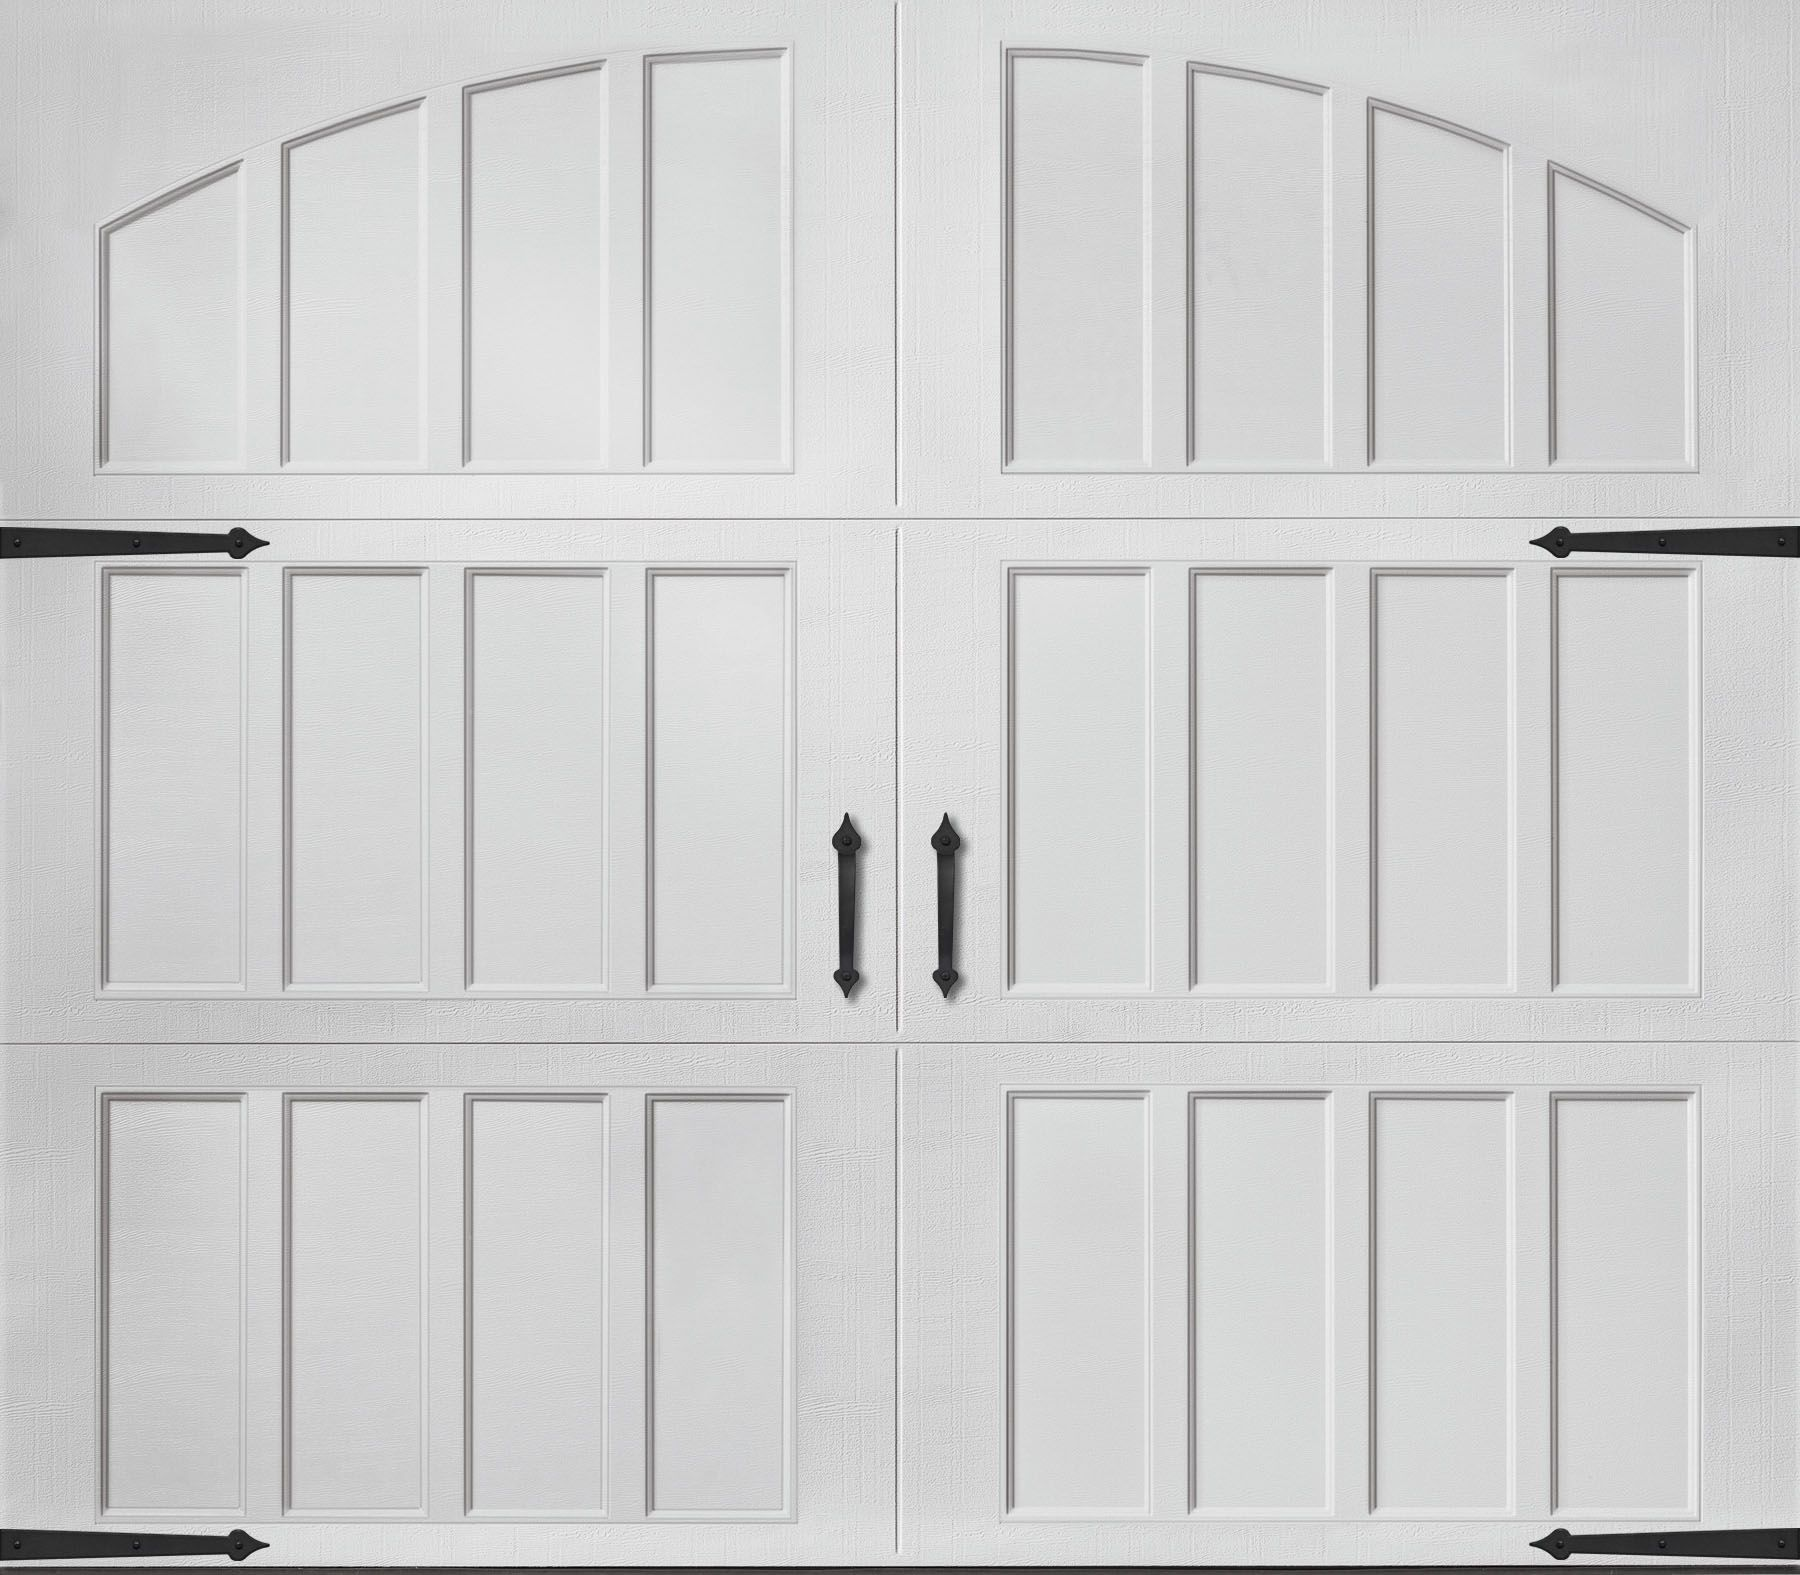 Classica panel cl northampton door design upper panel closed